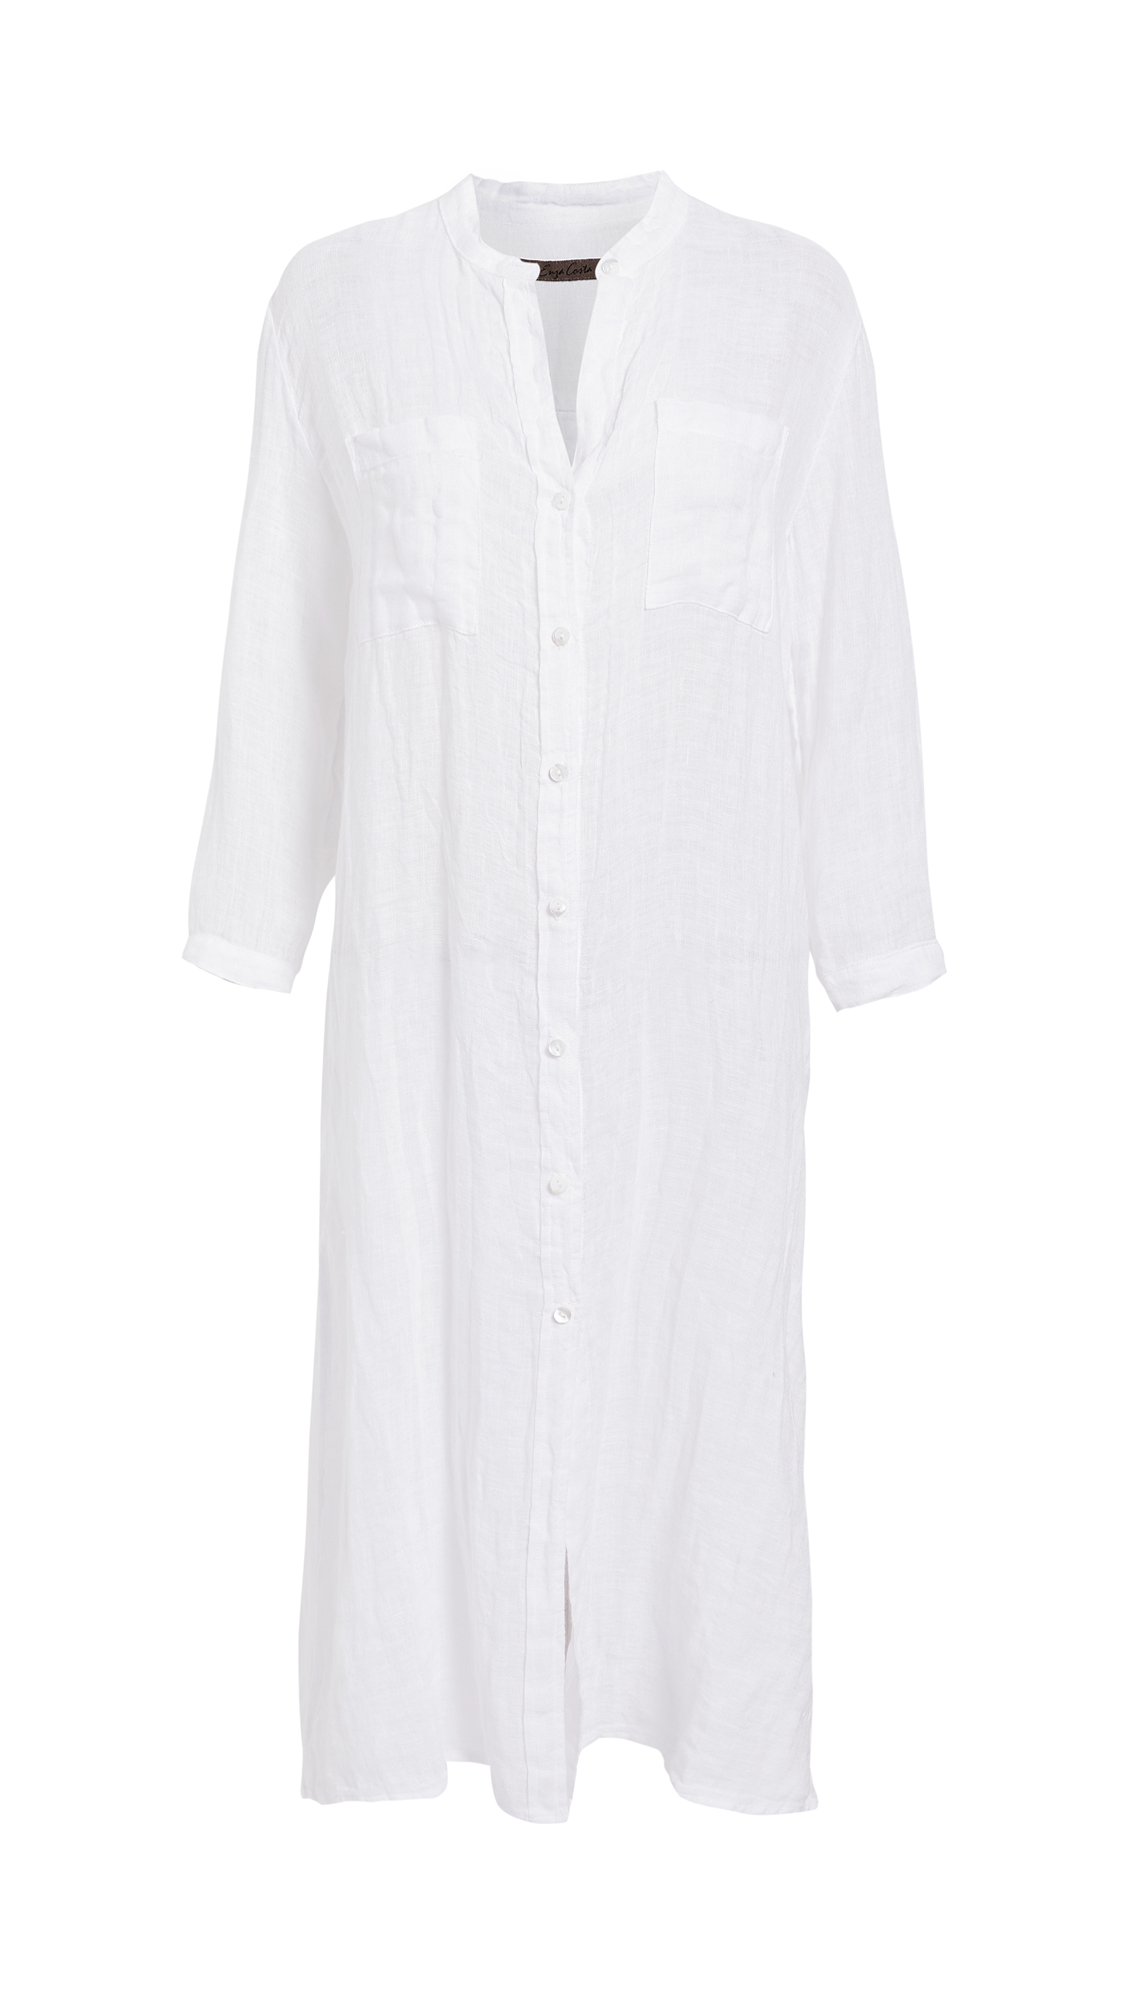 Enza Costa Linen Gauze Shirtdress